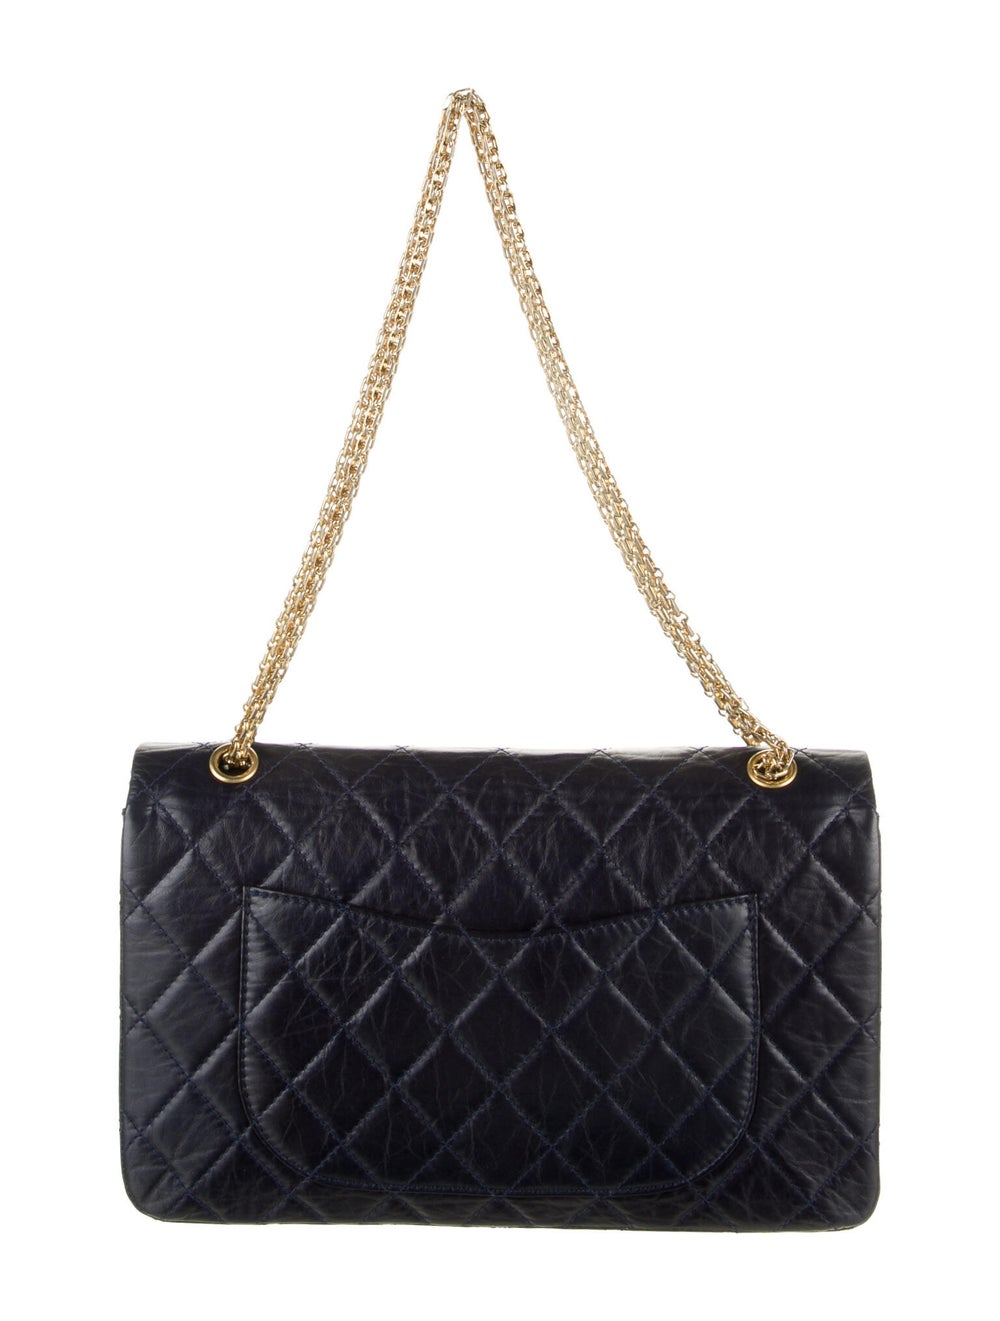 Chanel Reissue 227 Double Flap Bag Blue - image 4